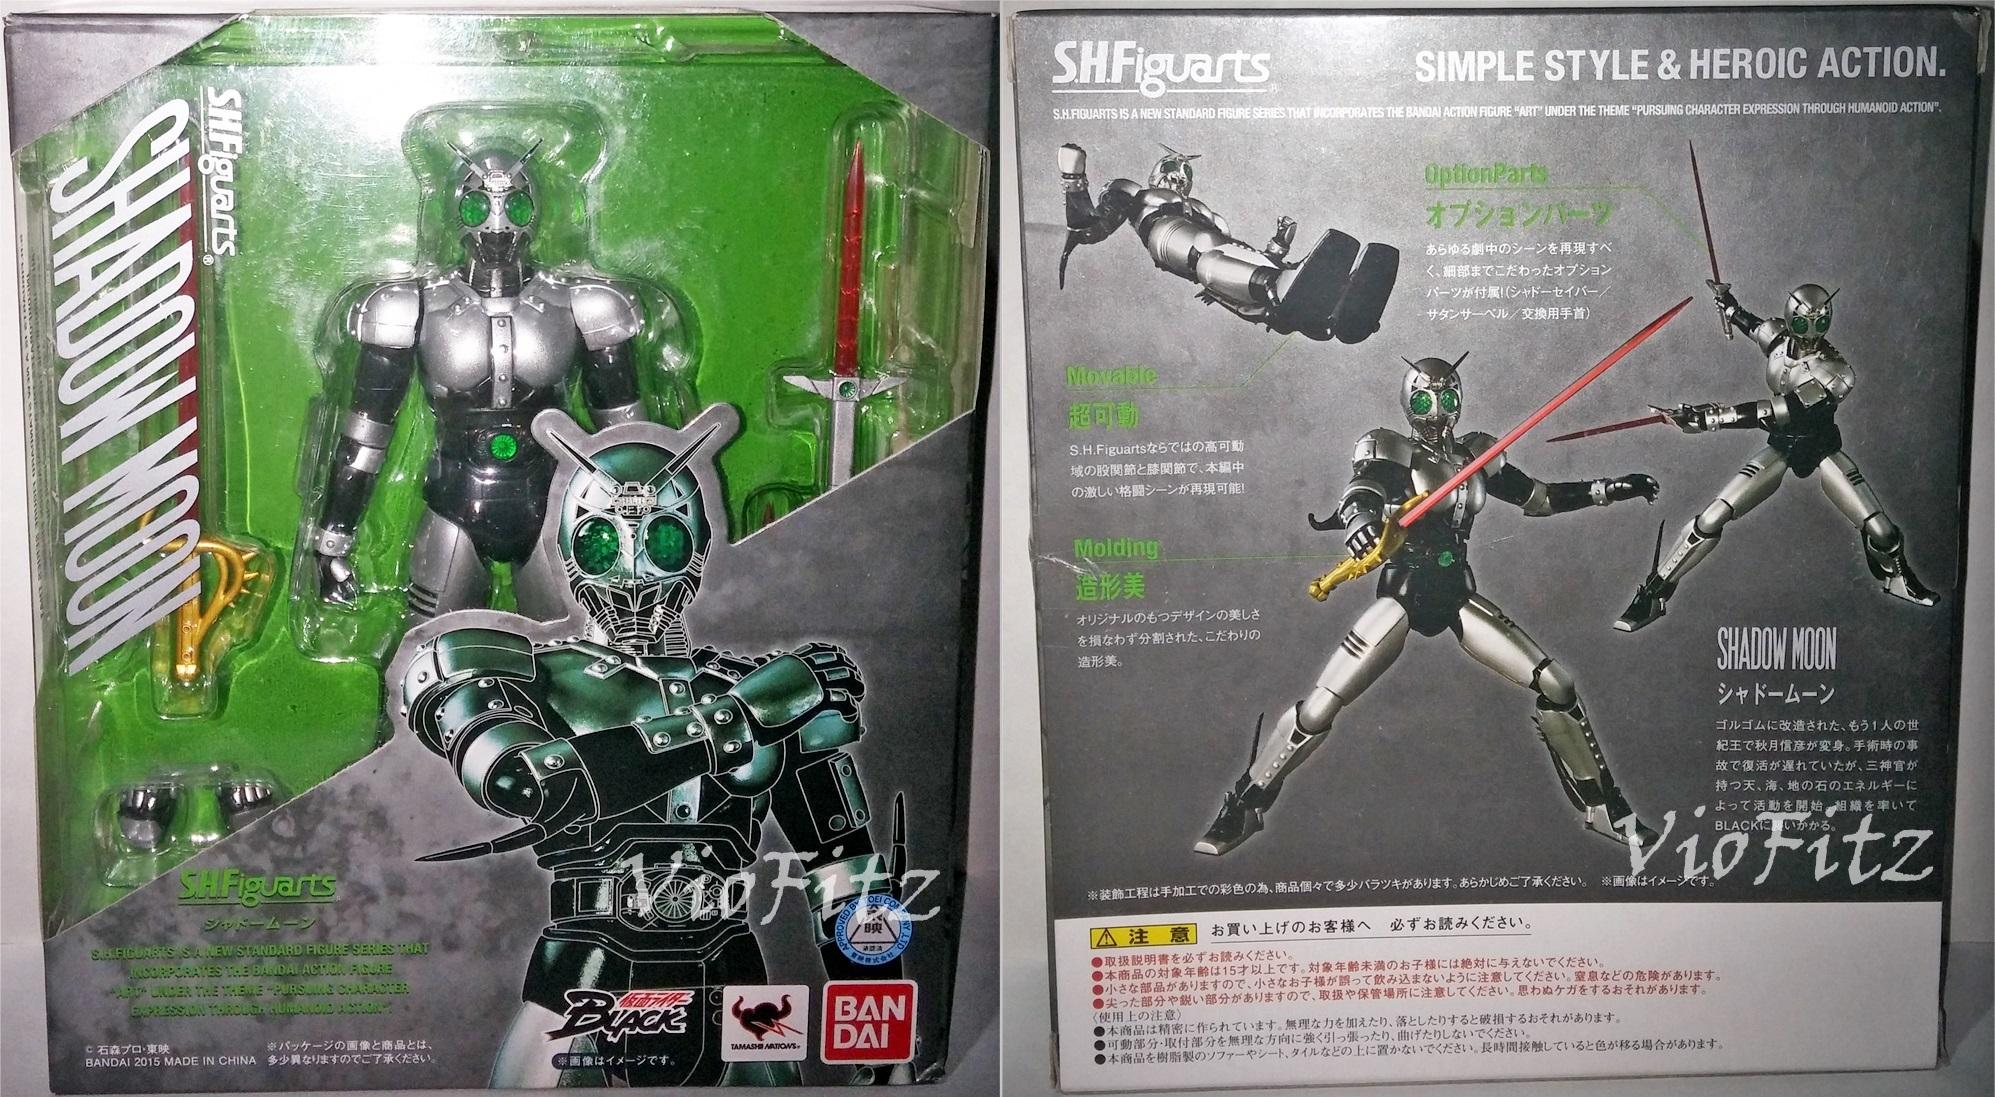 Kamen Rider Black RX   VioFitz   Page 3